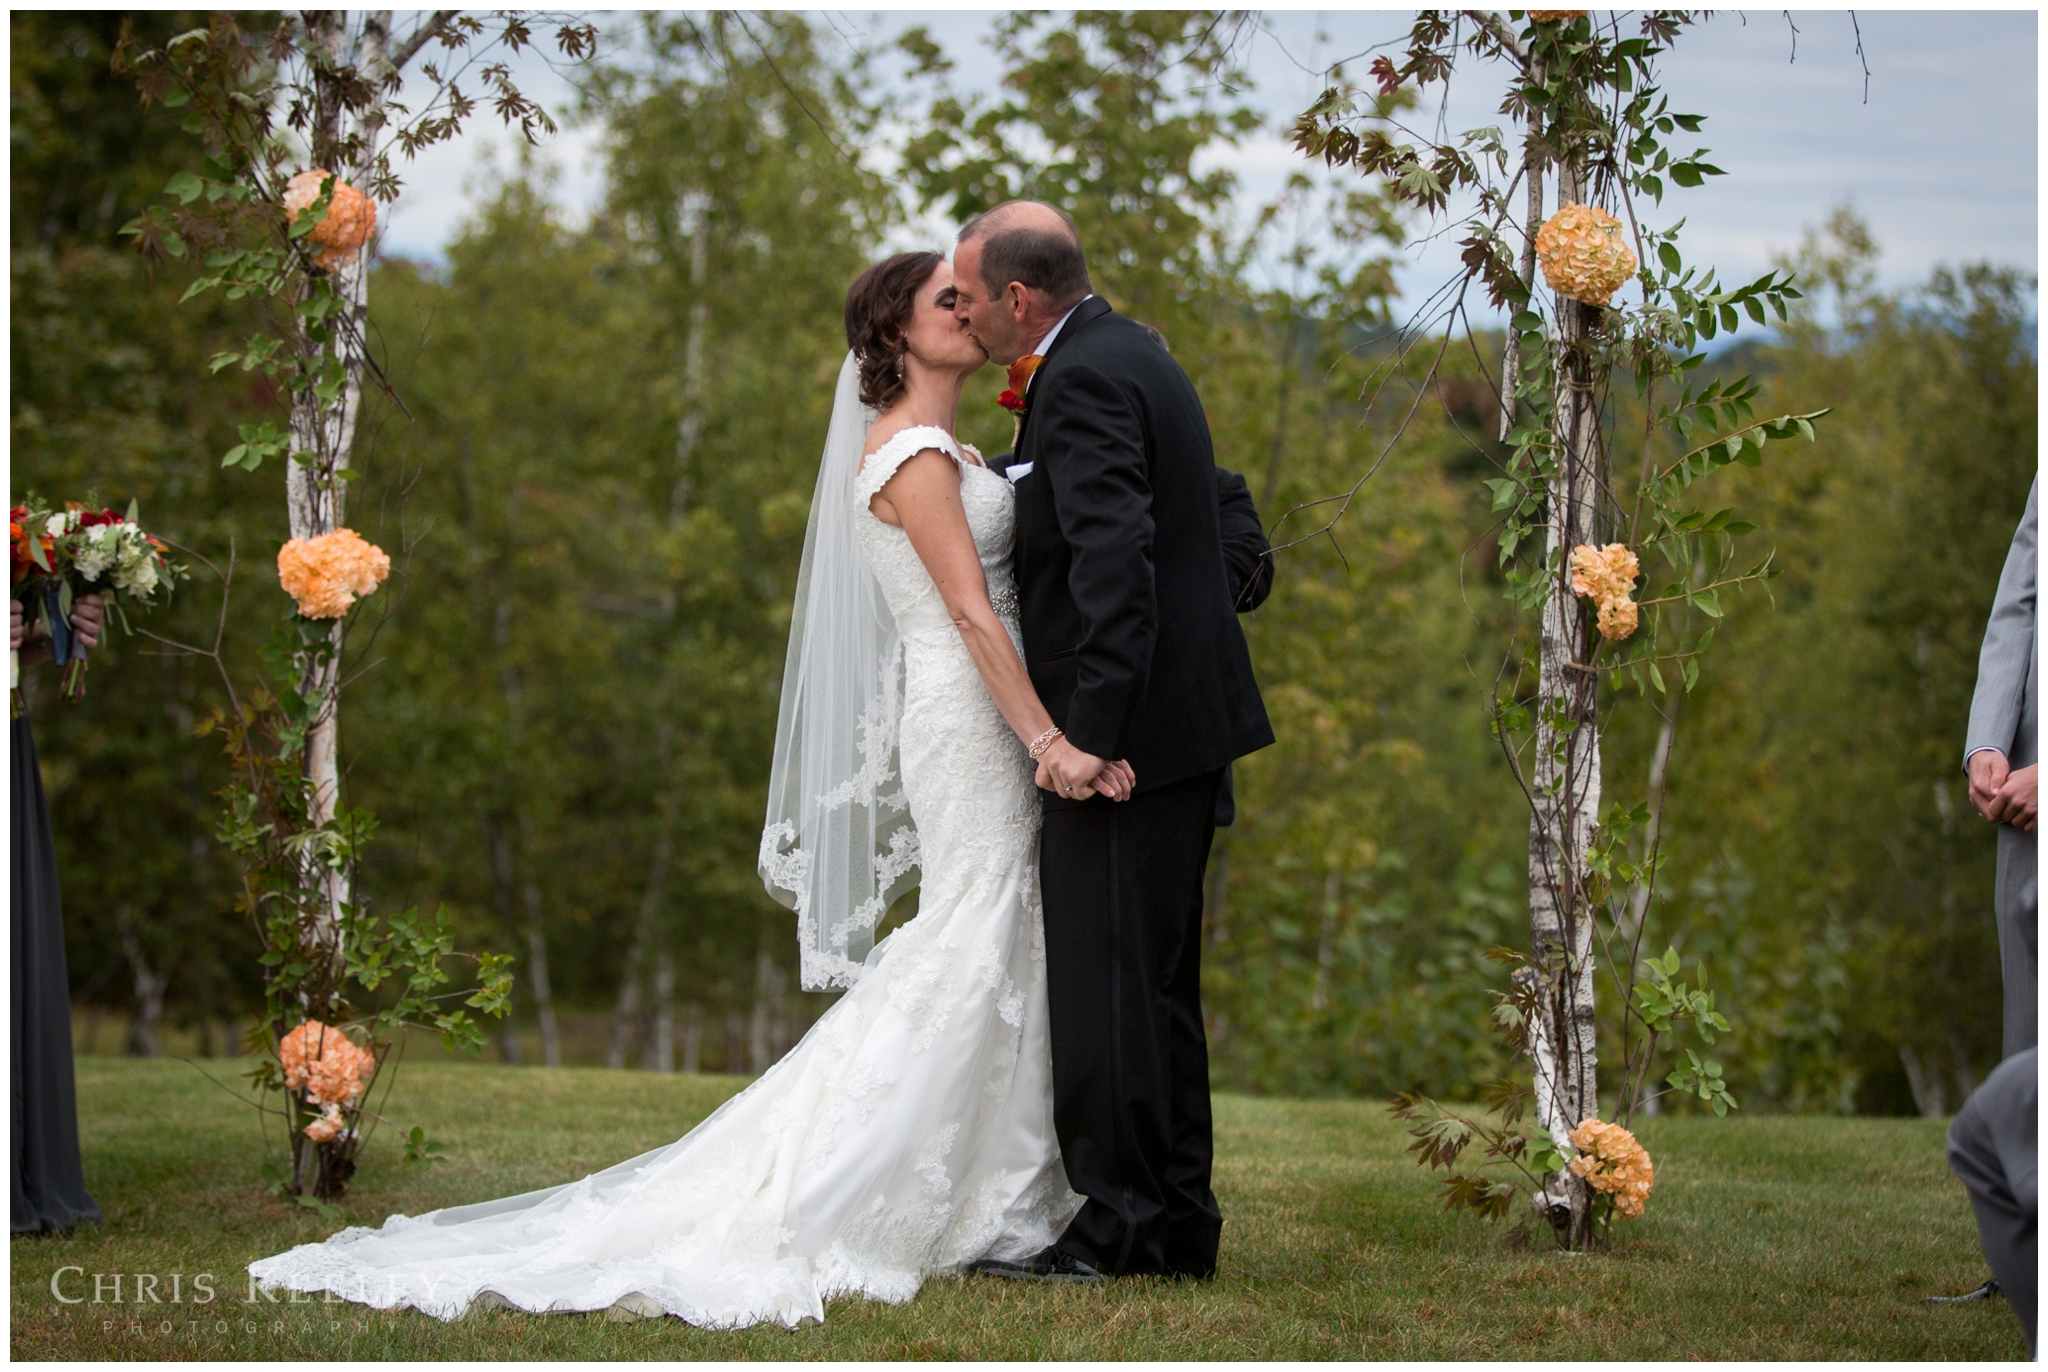 19-birch-hill-farm-new-hampshire-wedding-photographer-chris-keeley-photography.jpg